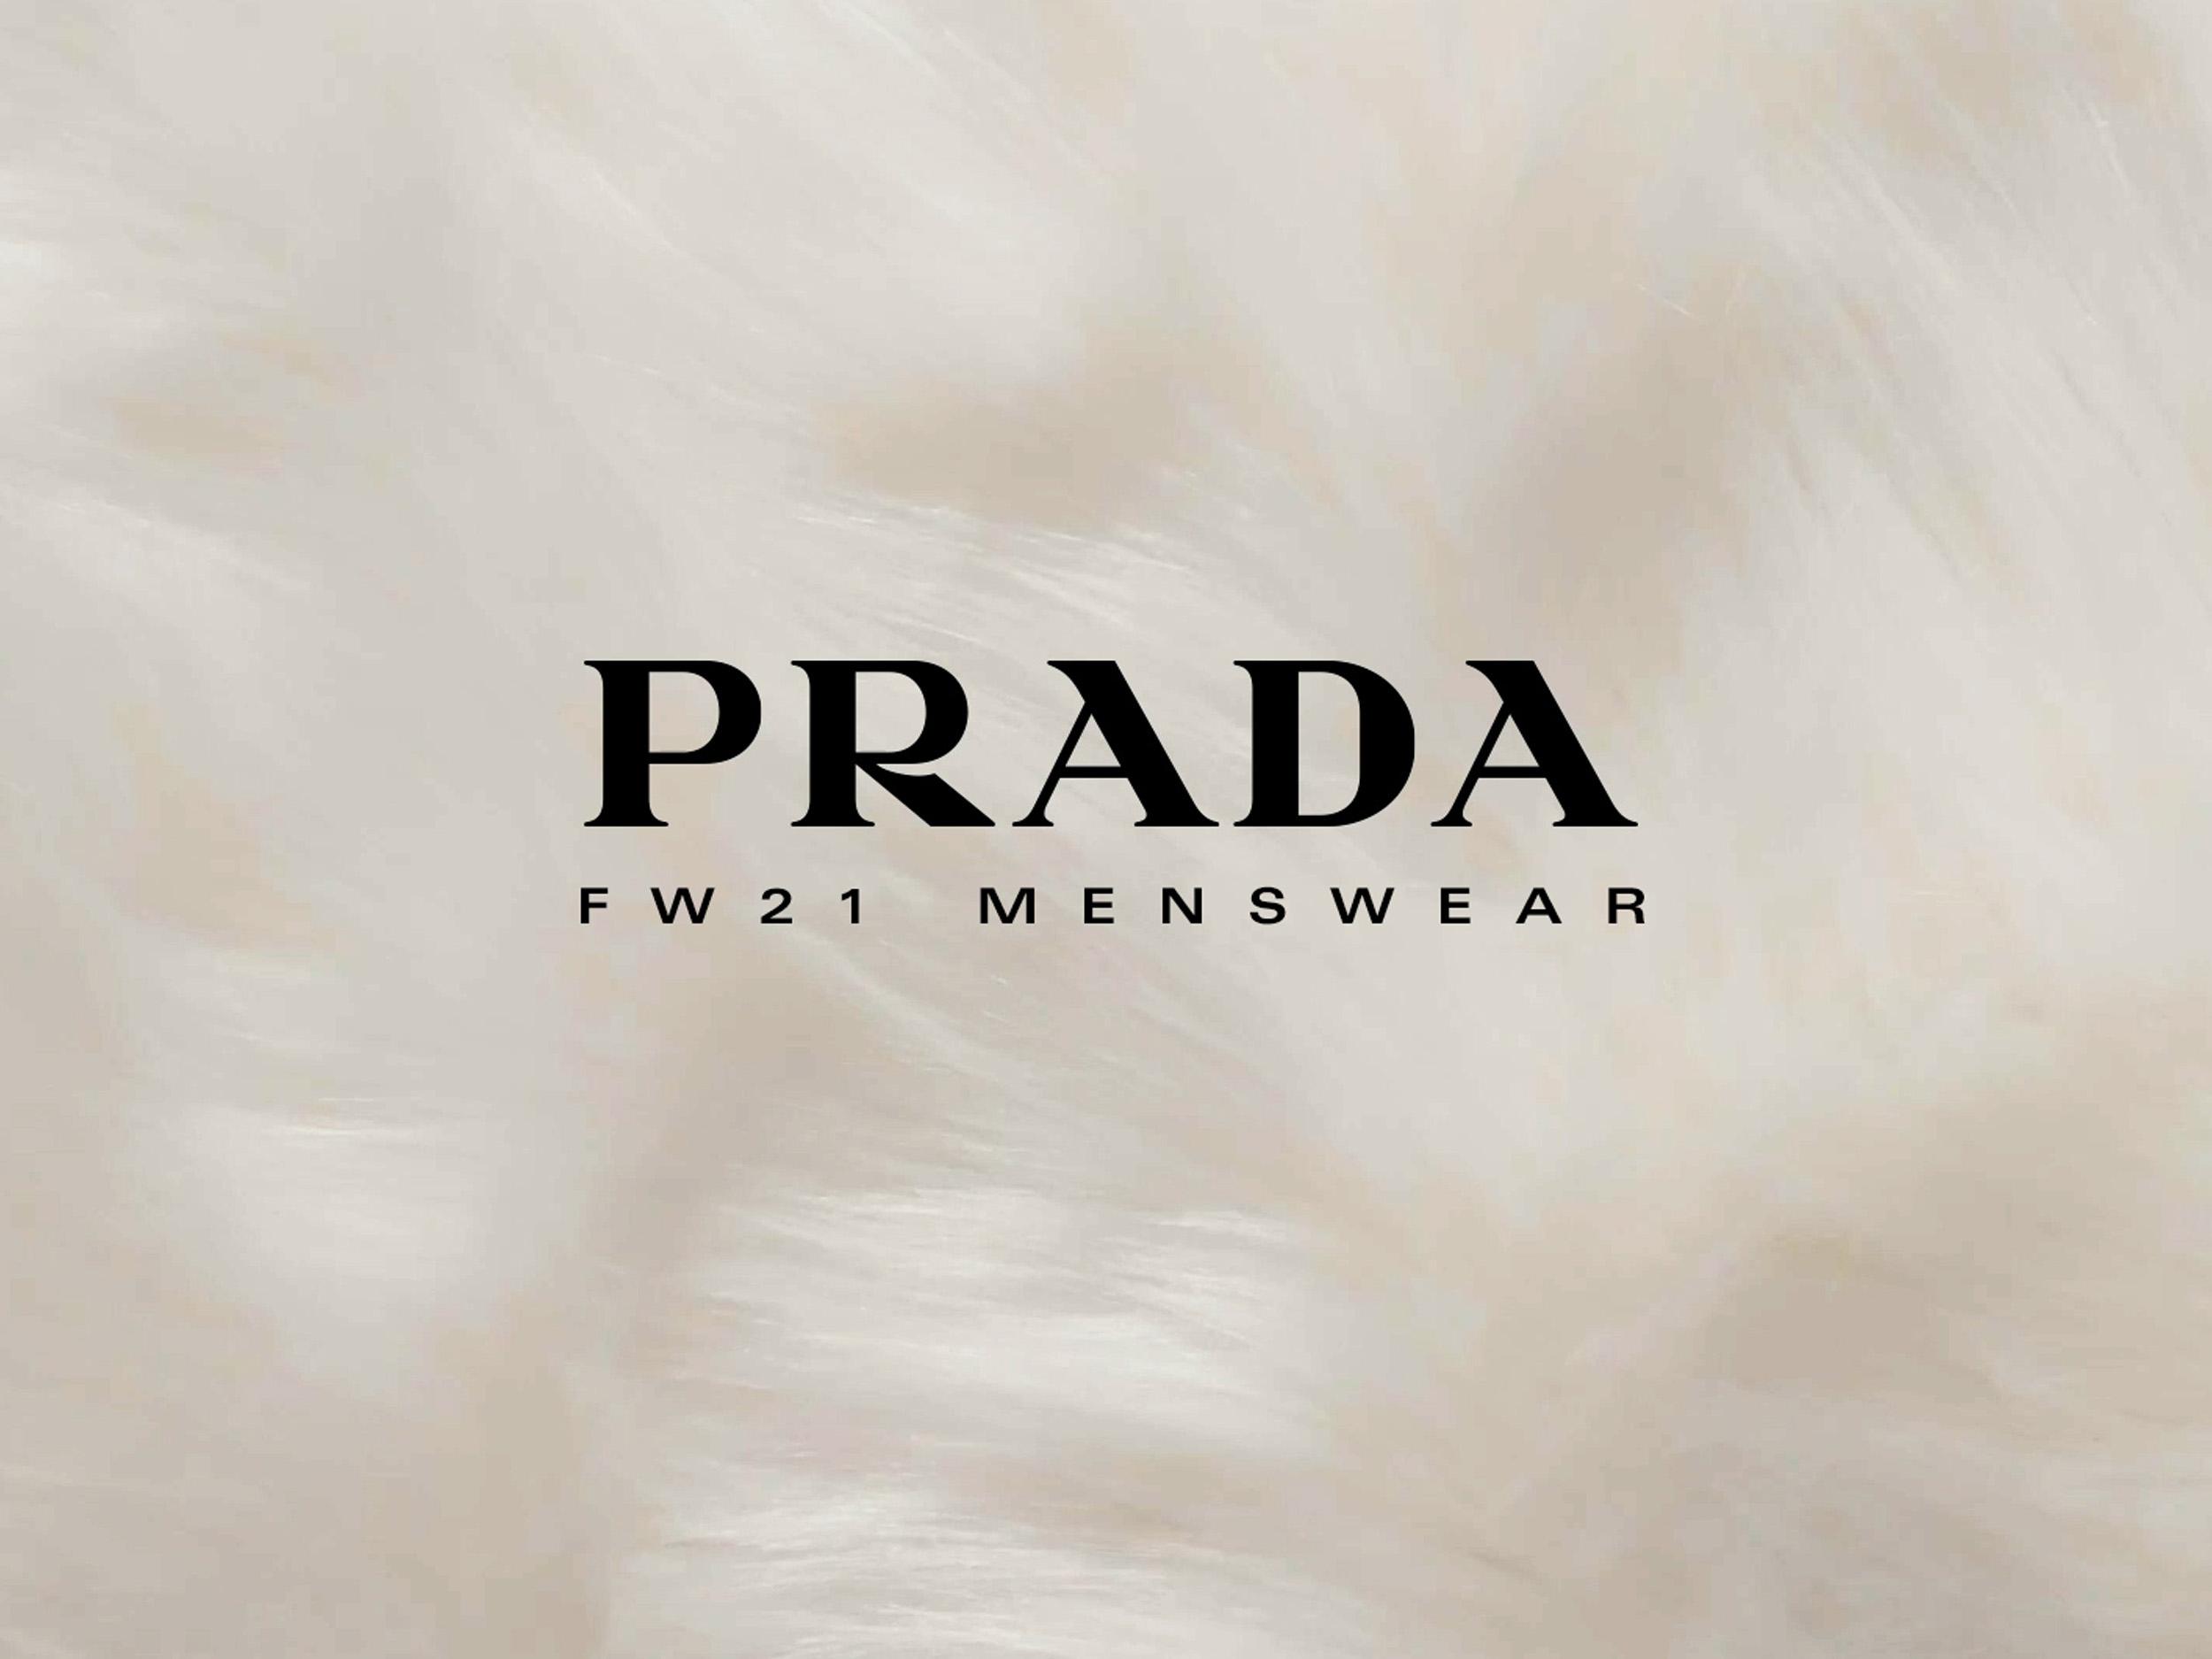 Livestream Prada Menswear Fall/Winter 2021 collection here